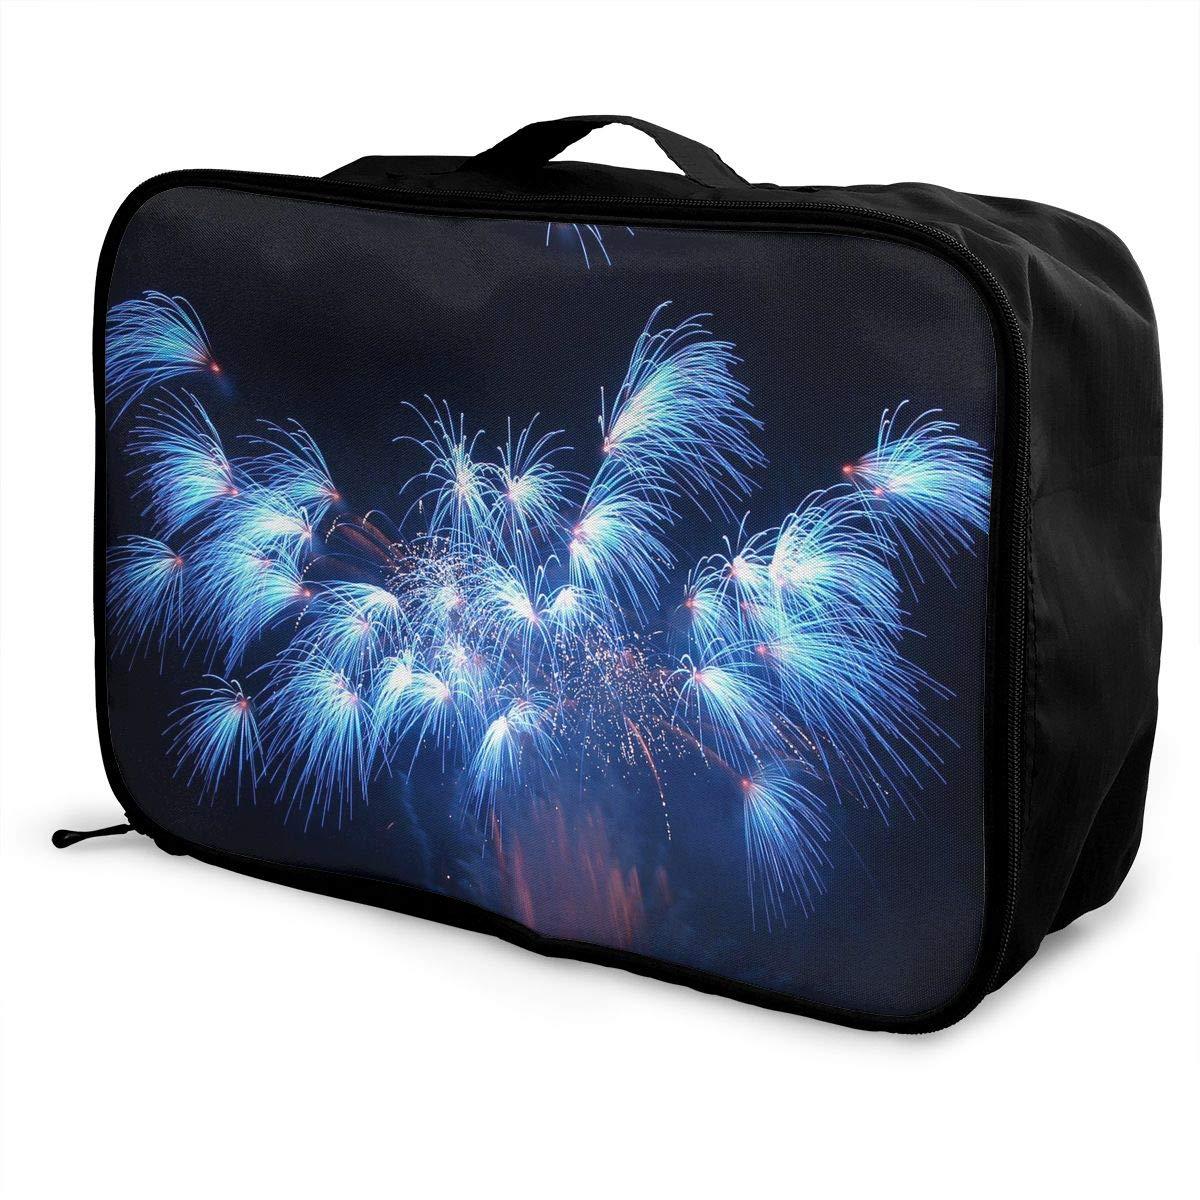 Travel Luggage Duffle Bag Lightweight Portable Handbag Fireworks Print Large Capacity Waterproof Foldable Storage Tote